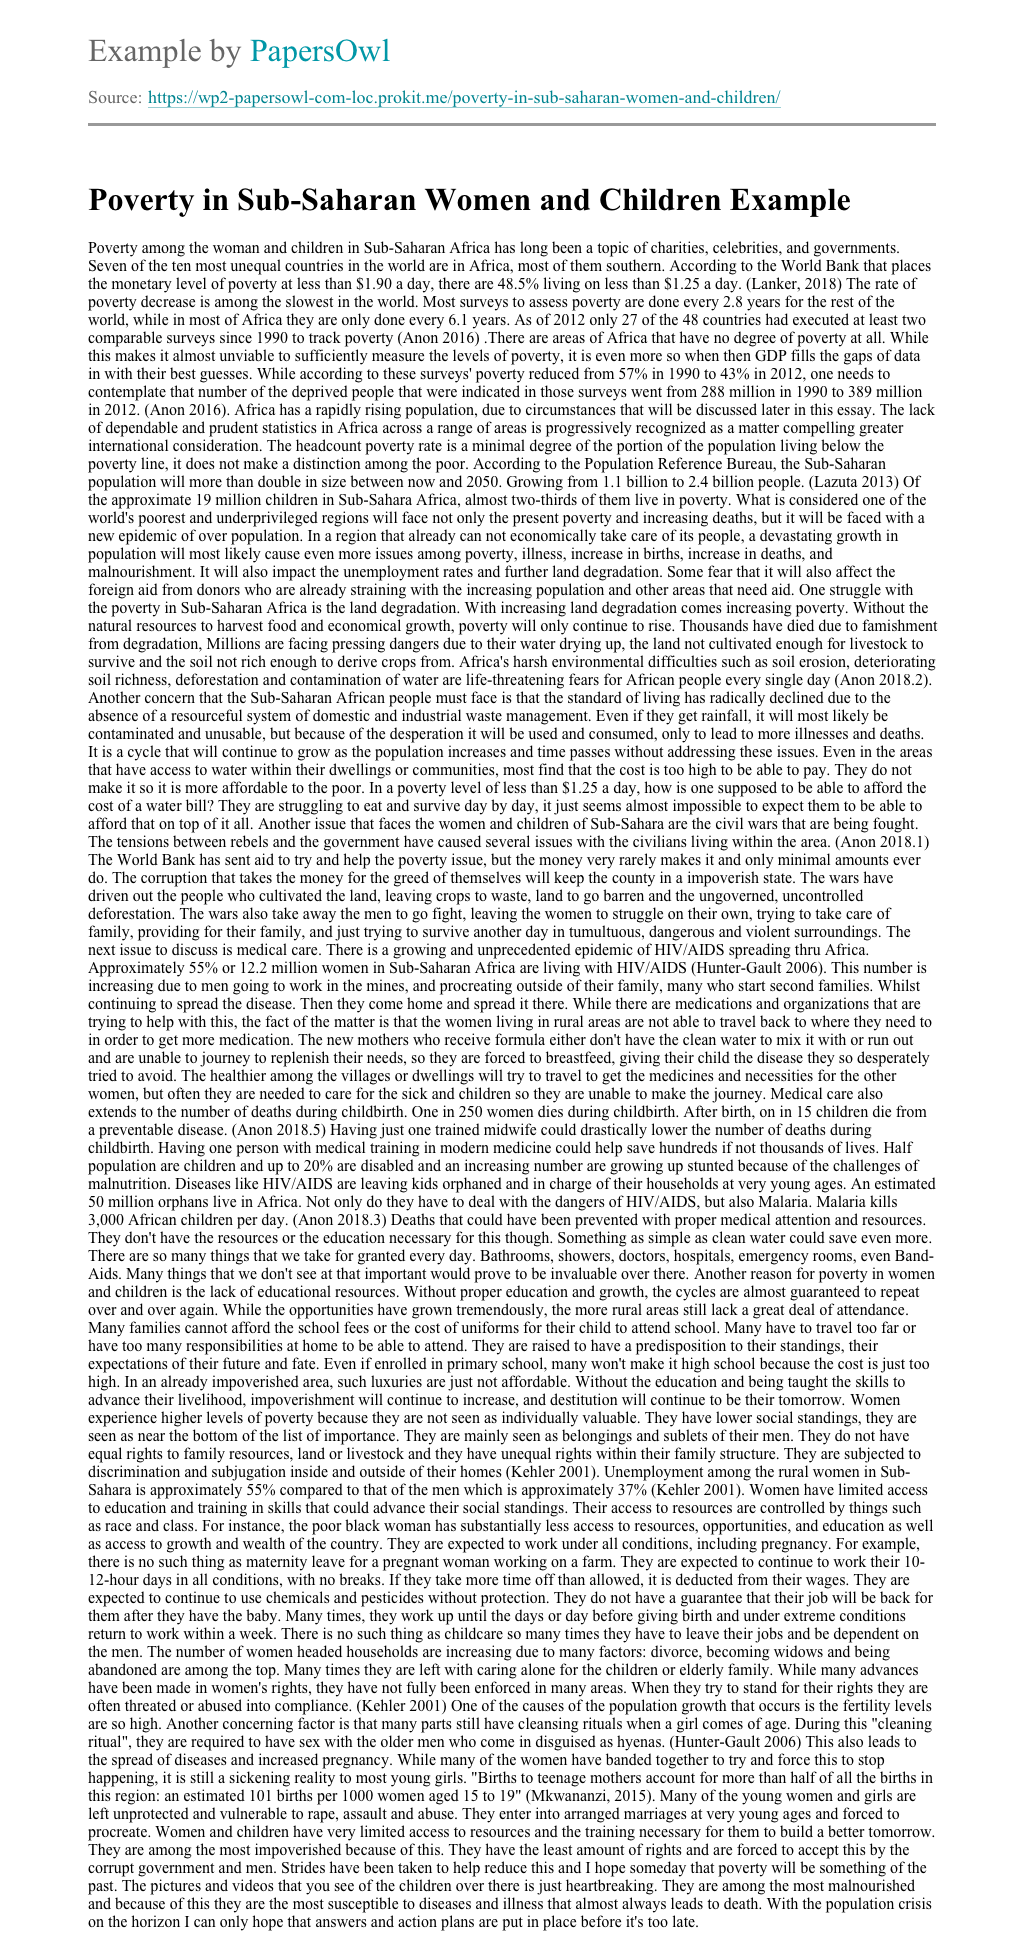 Personal essays focus on